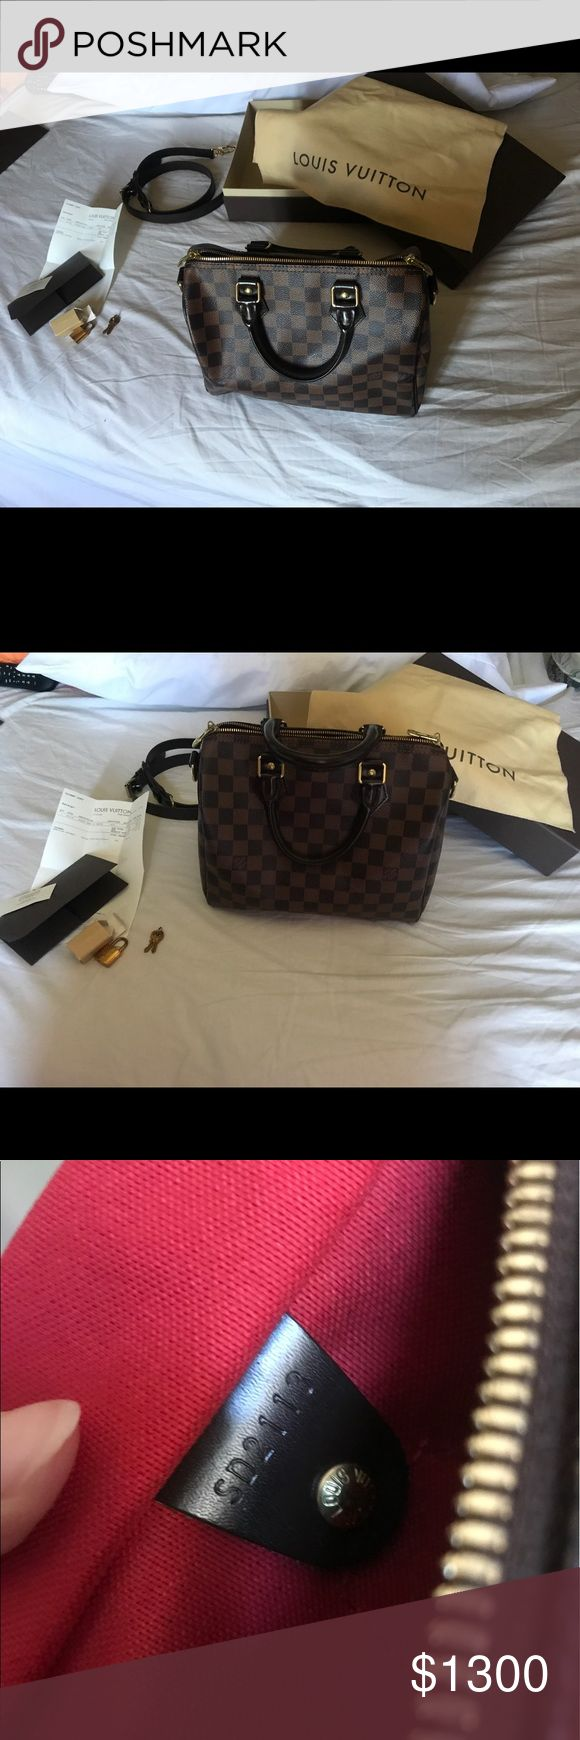 Authentic Louis Vuitton bandouliere 25 Great conditions, includes box, dust bag, receipt and key. 1000% auth Louis Vuitton Bags Shoulder Bags